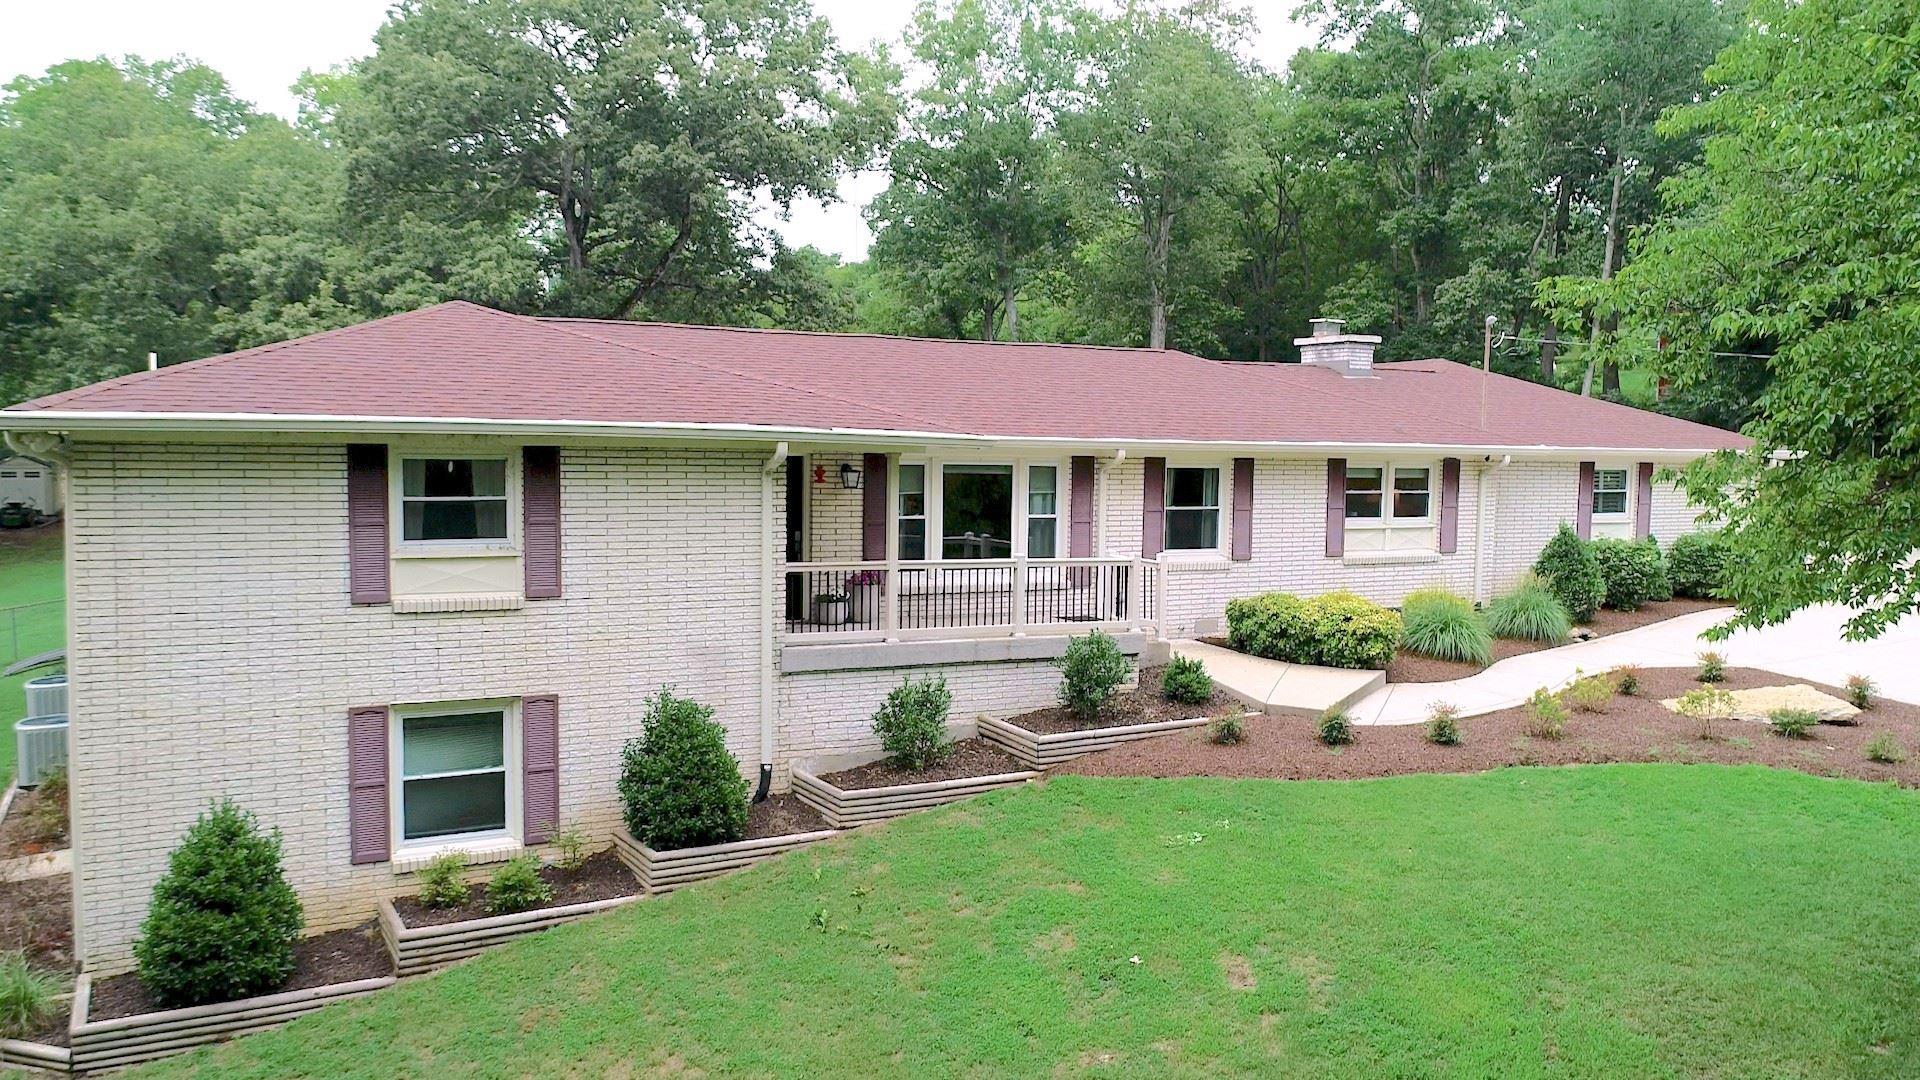 131 Mallard Dr, Hendersonville, TN 37075 - MLS#: 2176471